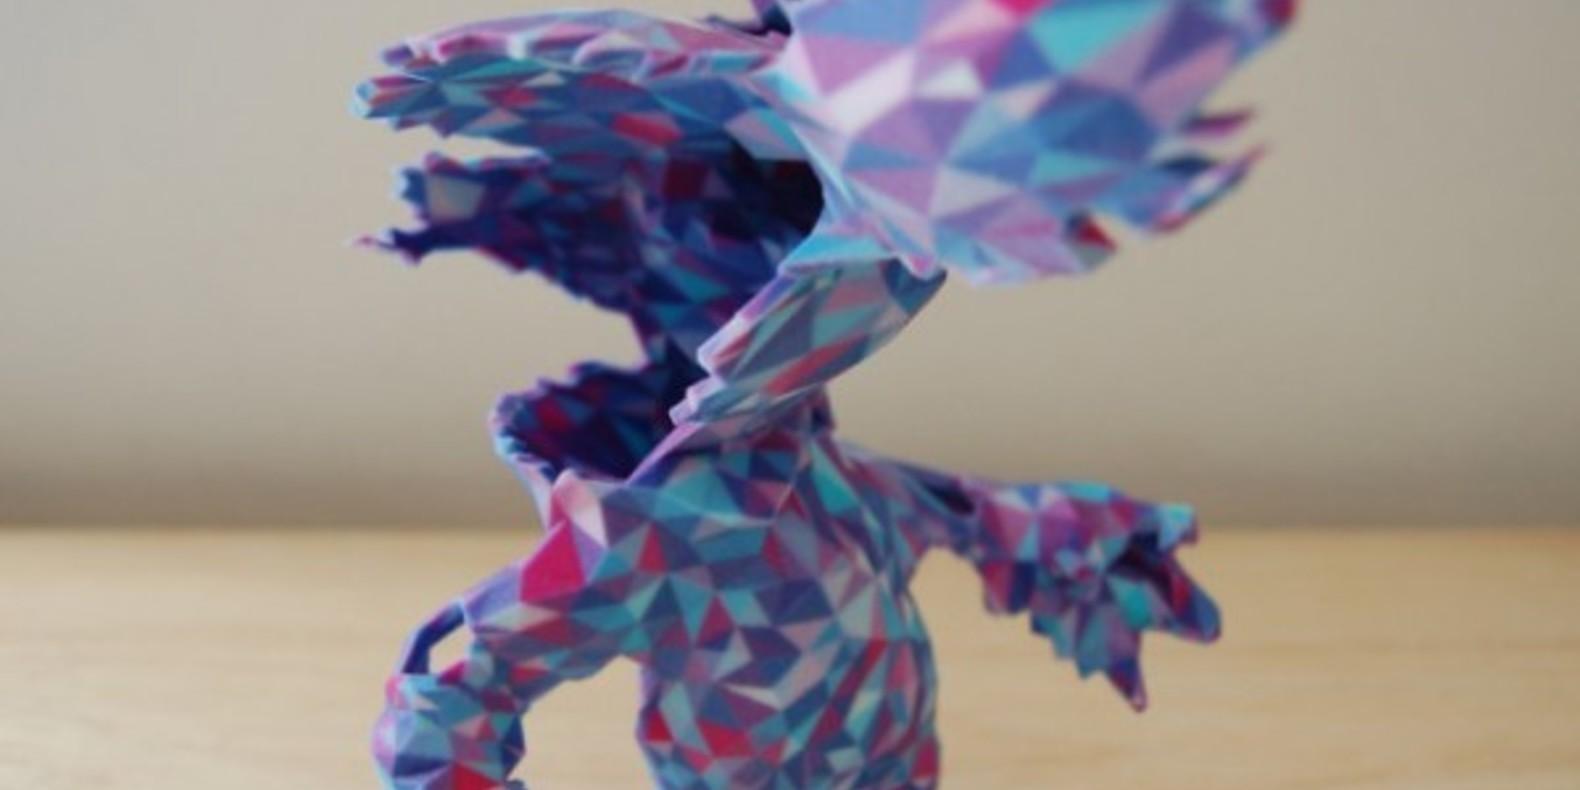 sekuMoiMecy Matthew Plummer-Fernandez impression 3D printing cults fichier mickey mouse 3